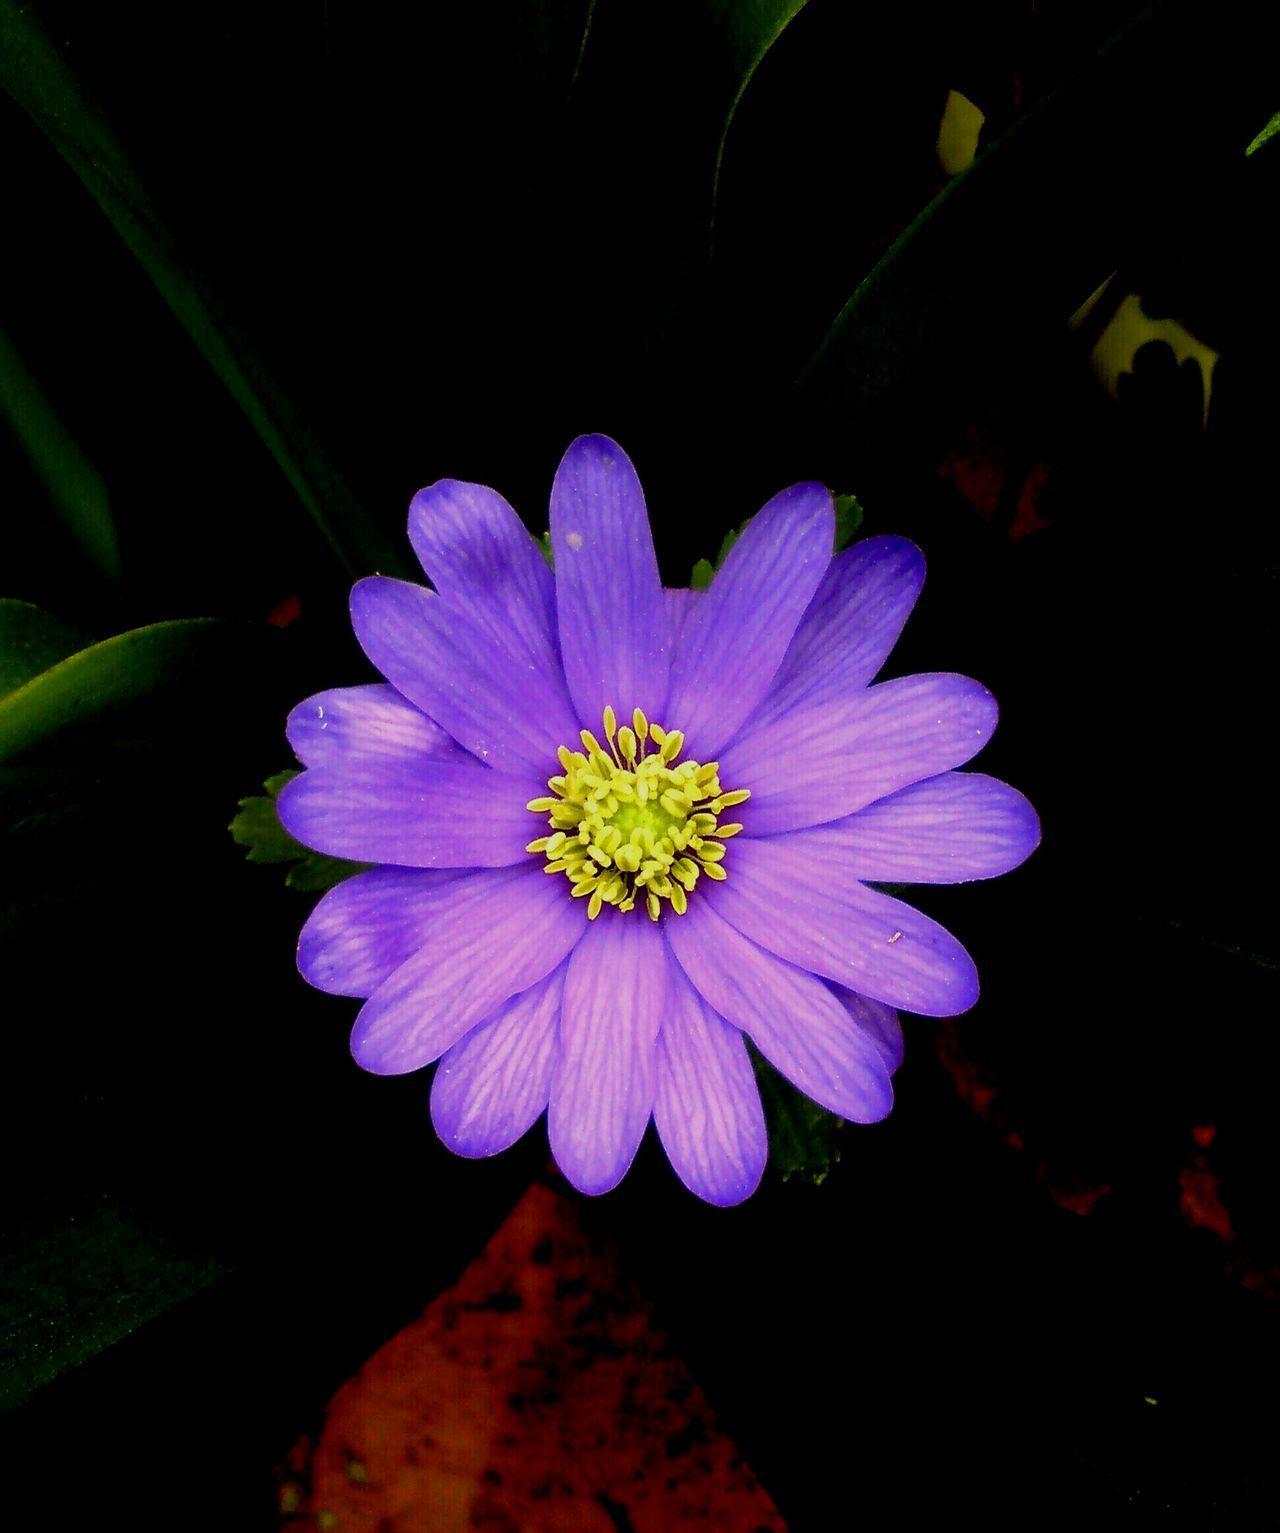 Close Up Nature Purple Flower Purple Flower Close Up Yellow Centered Flowers Yellow Centre Dark Background